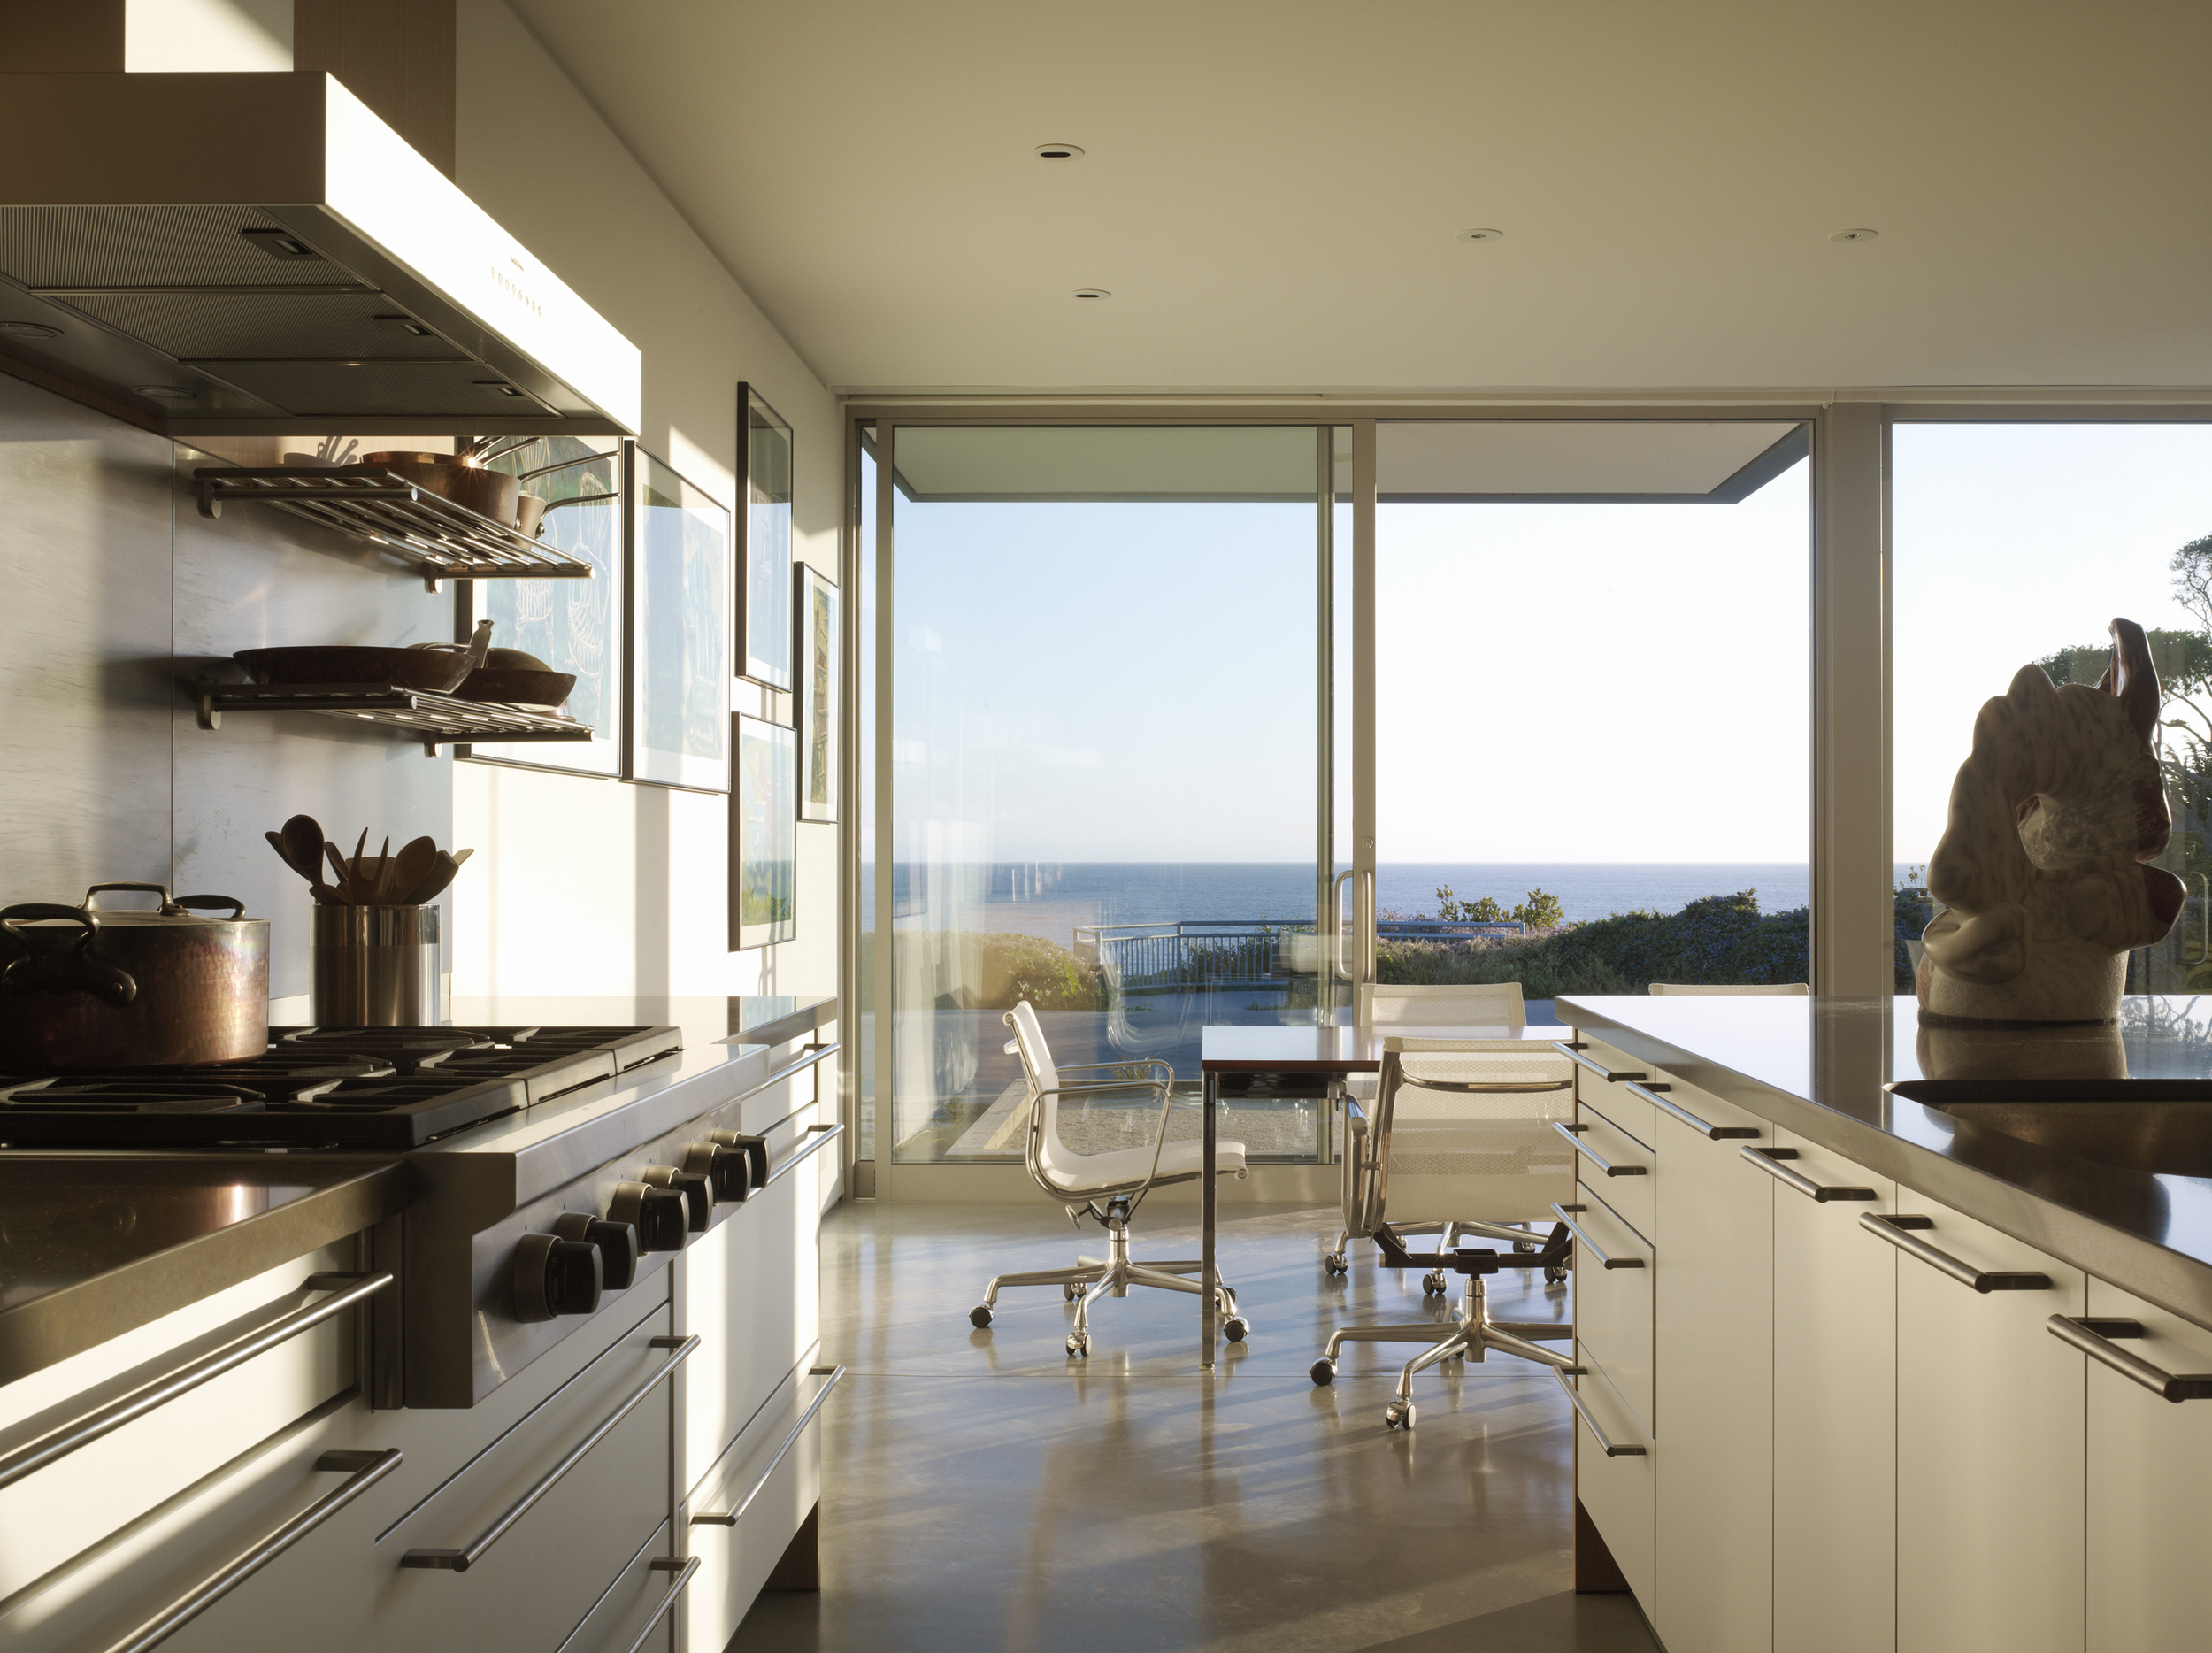 SnyderDiamond Takashi Yanai kitchen with view.jpg